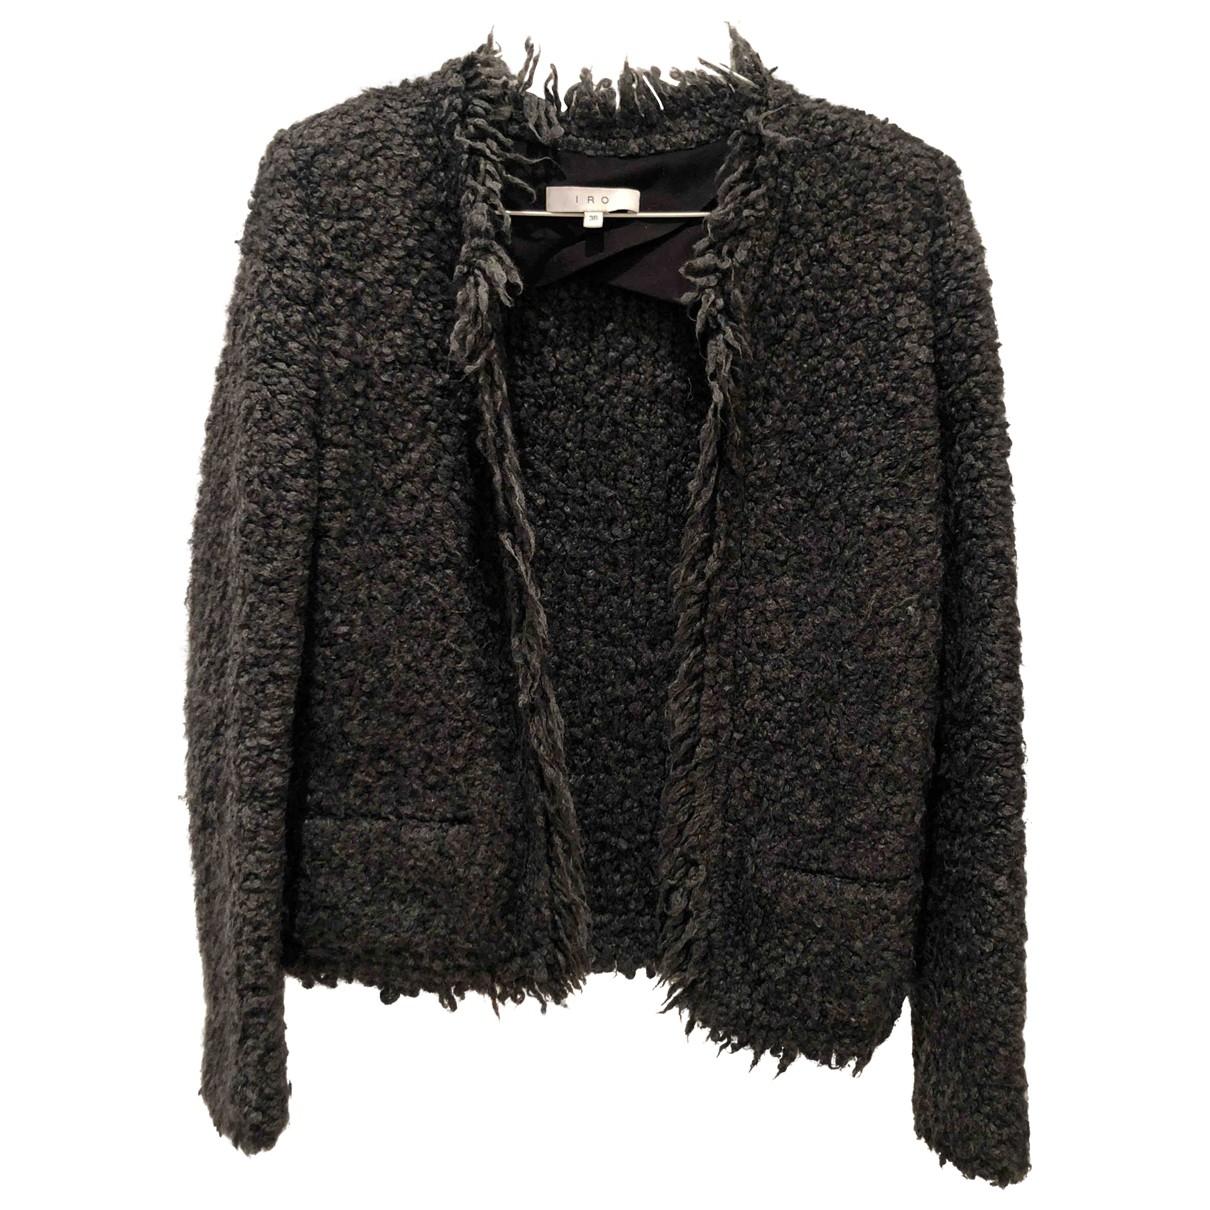 Iro \N Grey Wool jacket for Women 36 FR